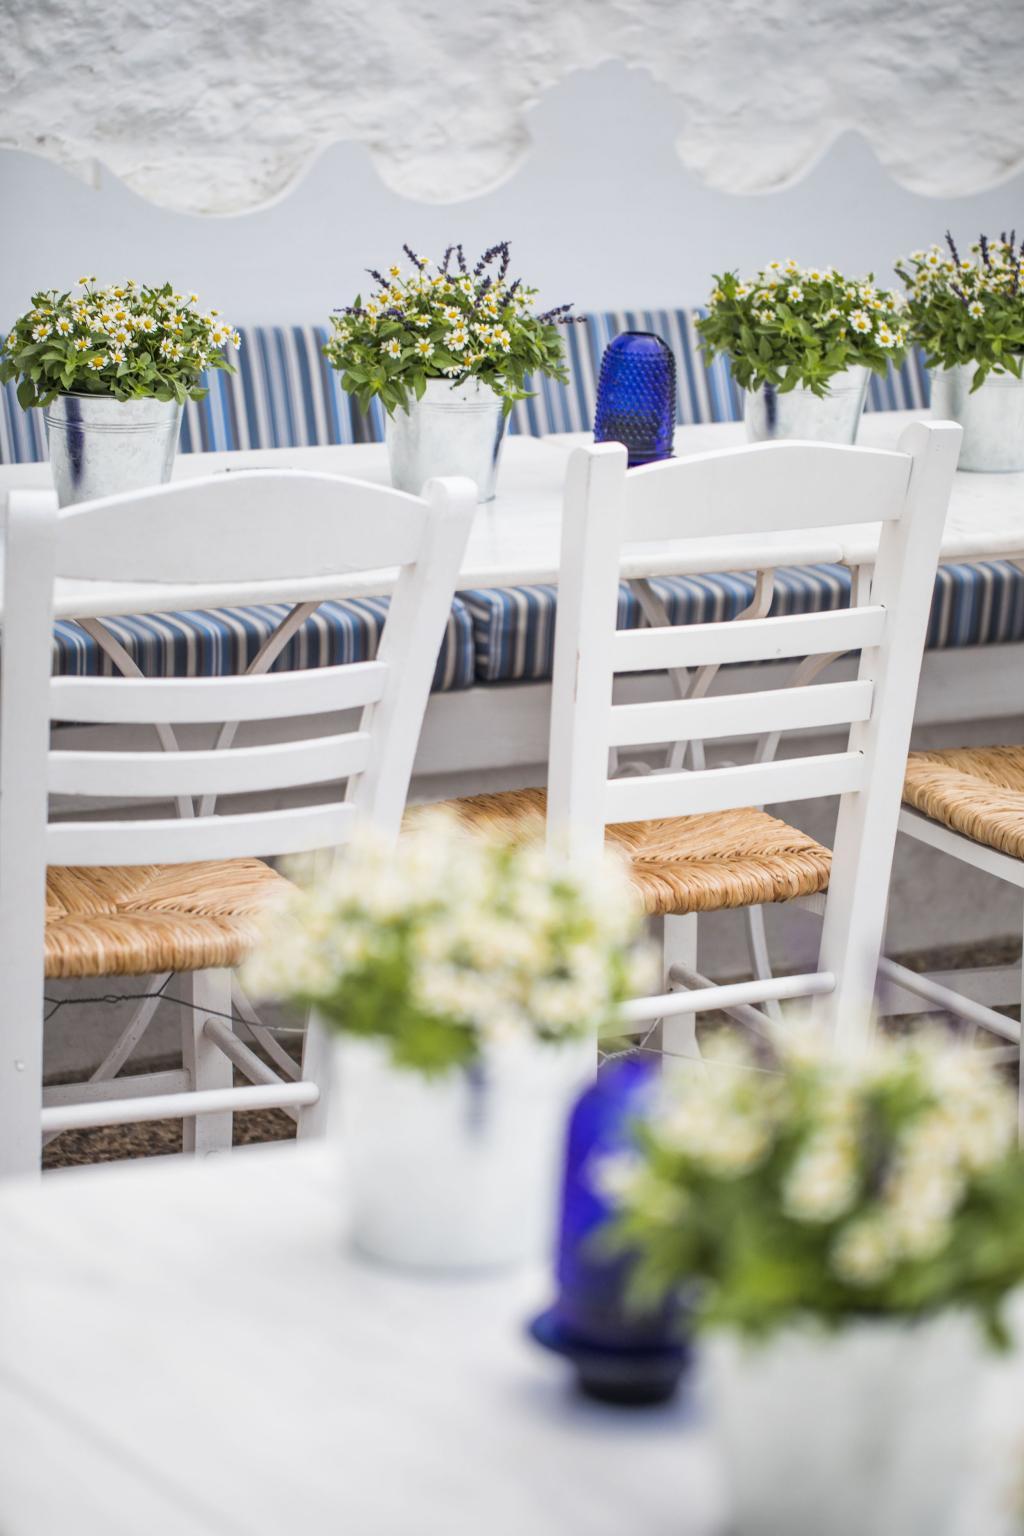 L&T Spetses pre-wedding - Image 5